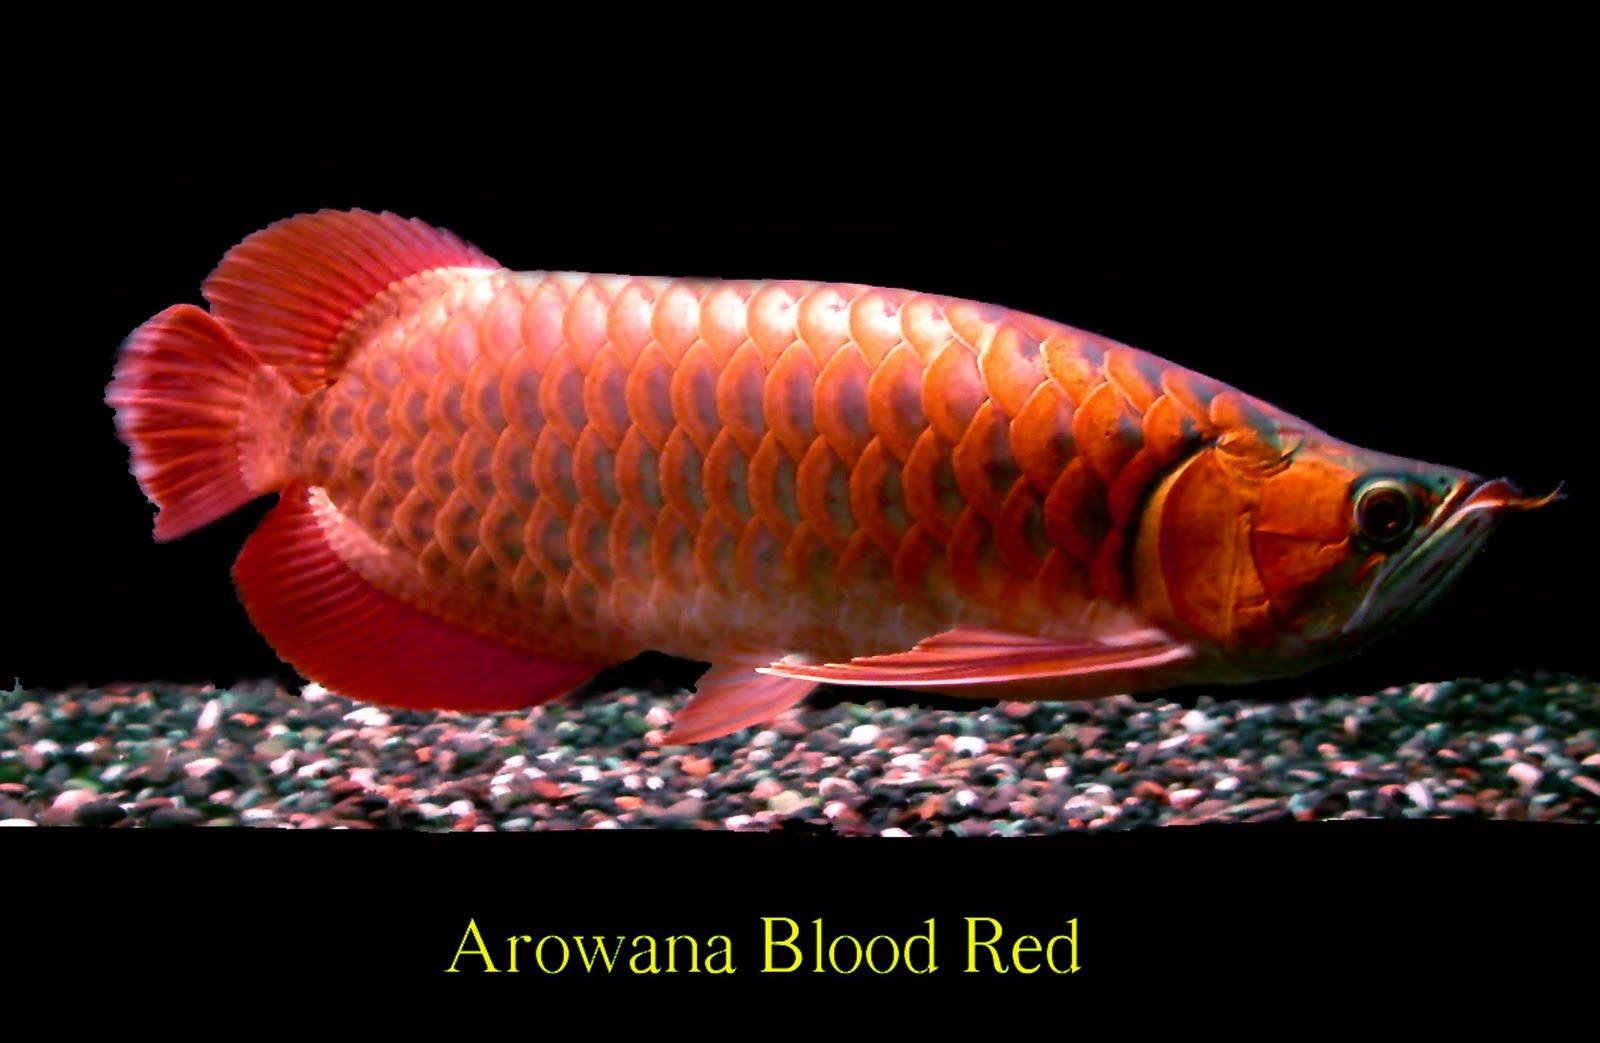 Arowana aquaculture